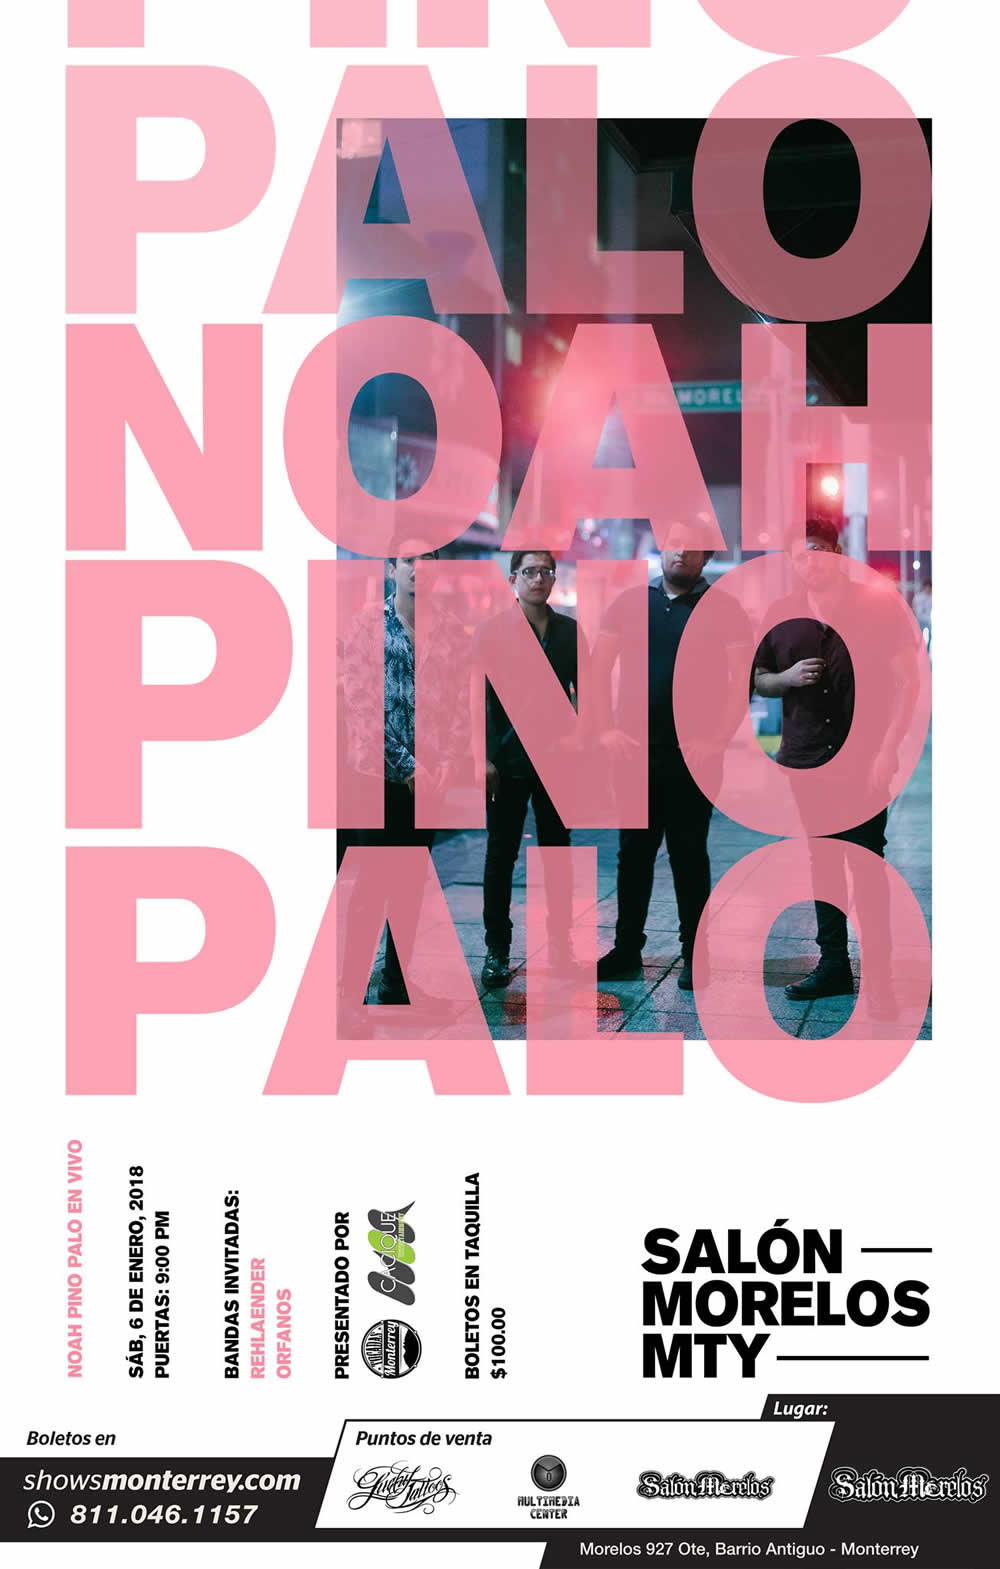 Noah Pino Palo en Salón Morelos